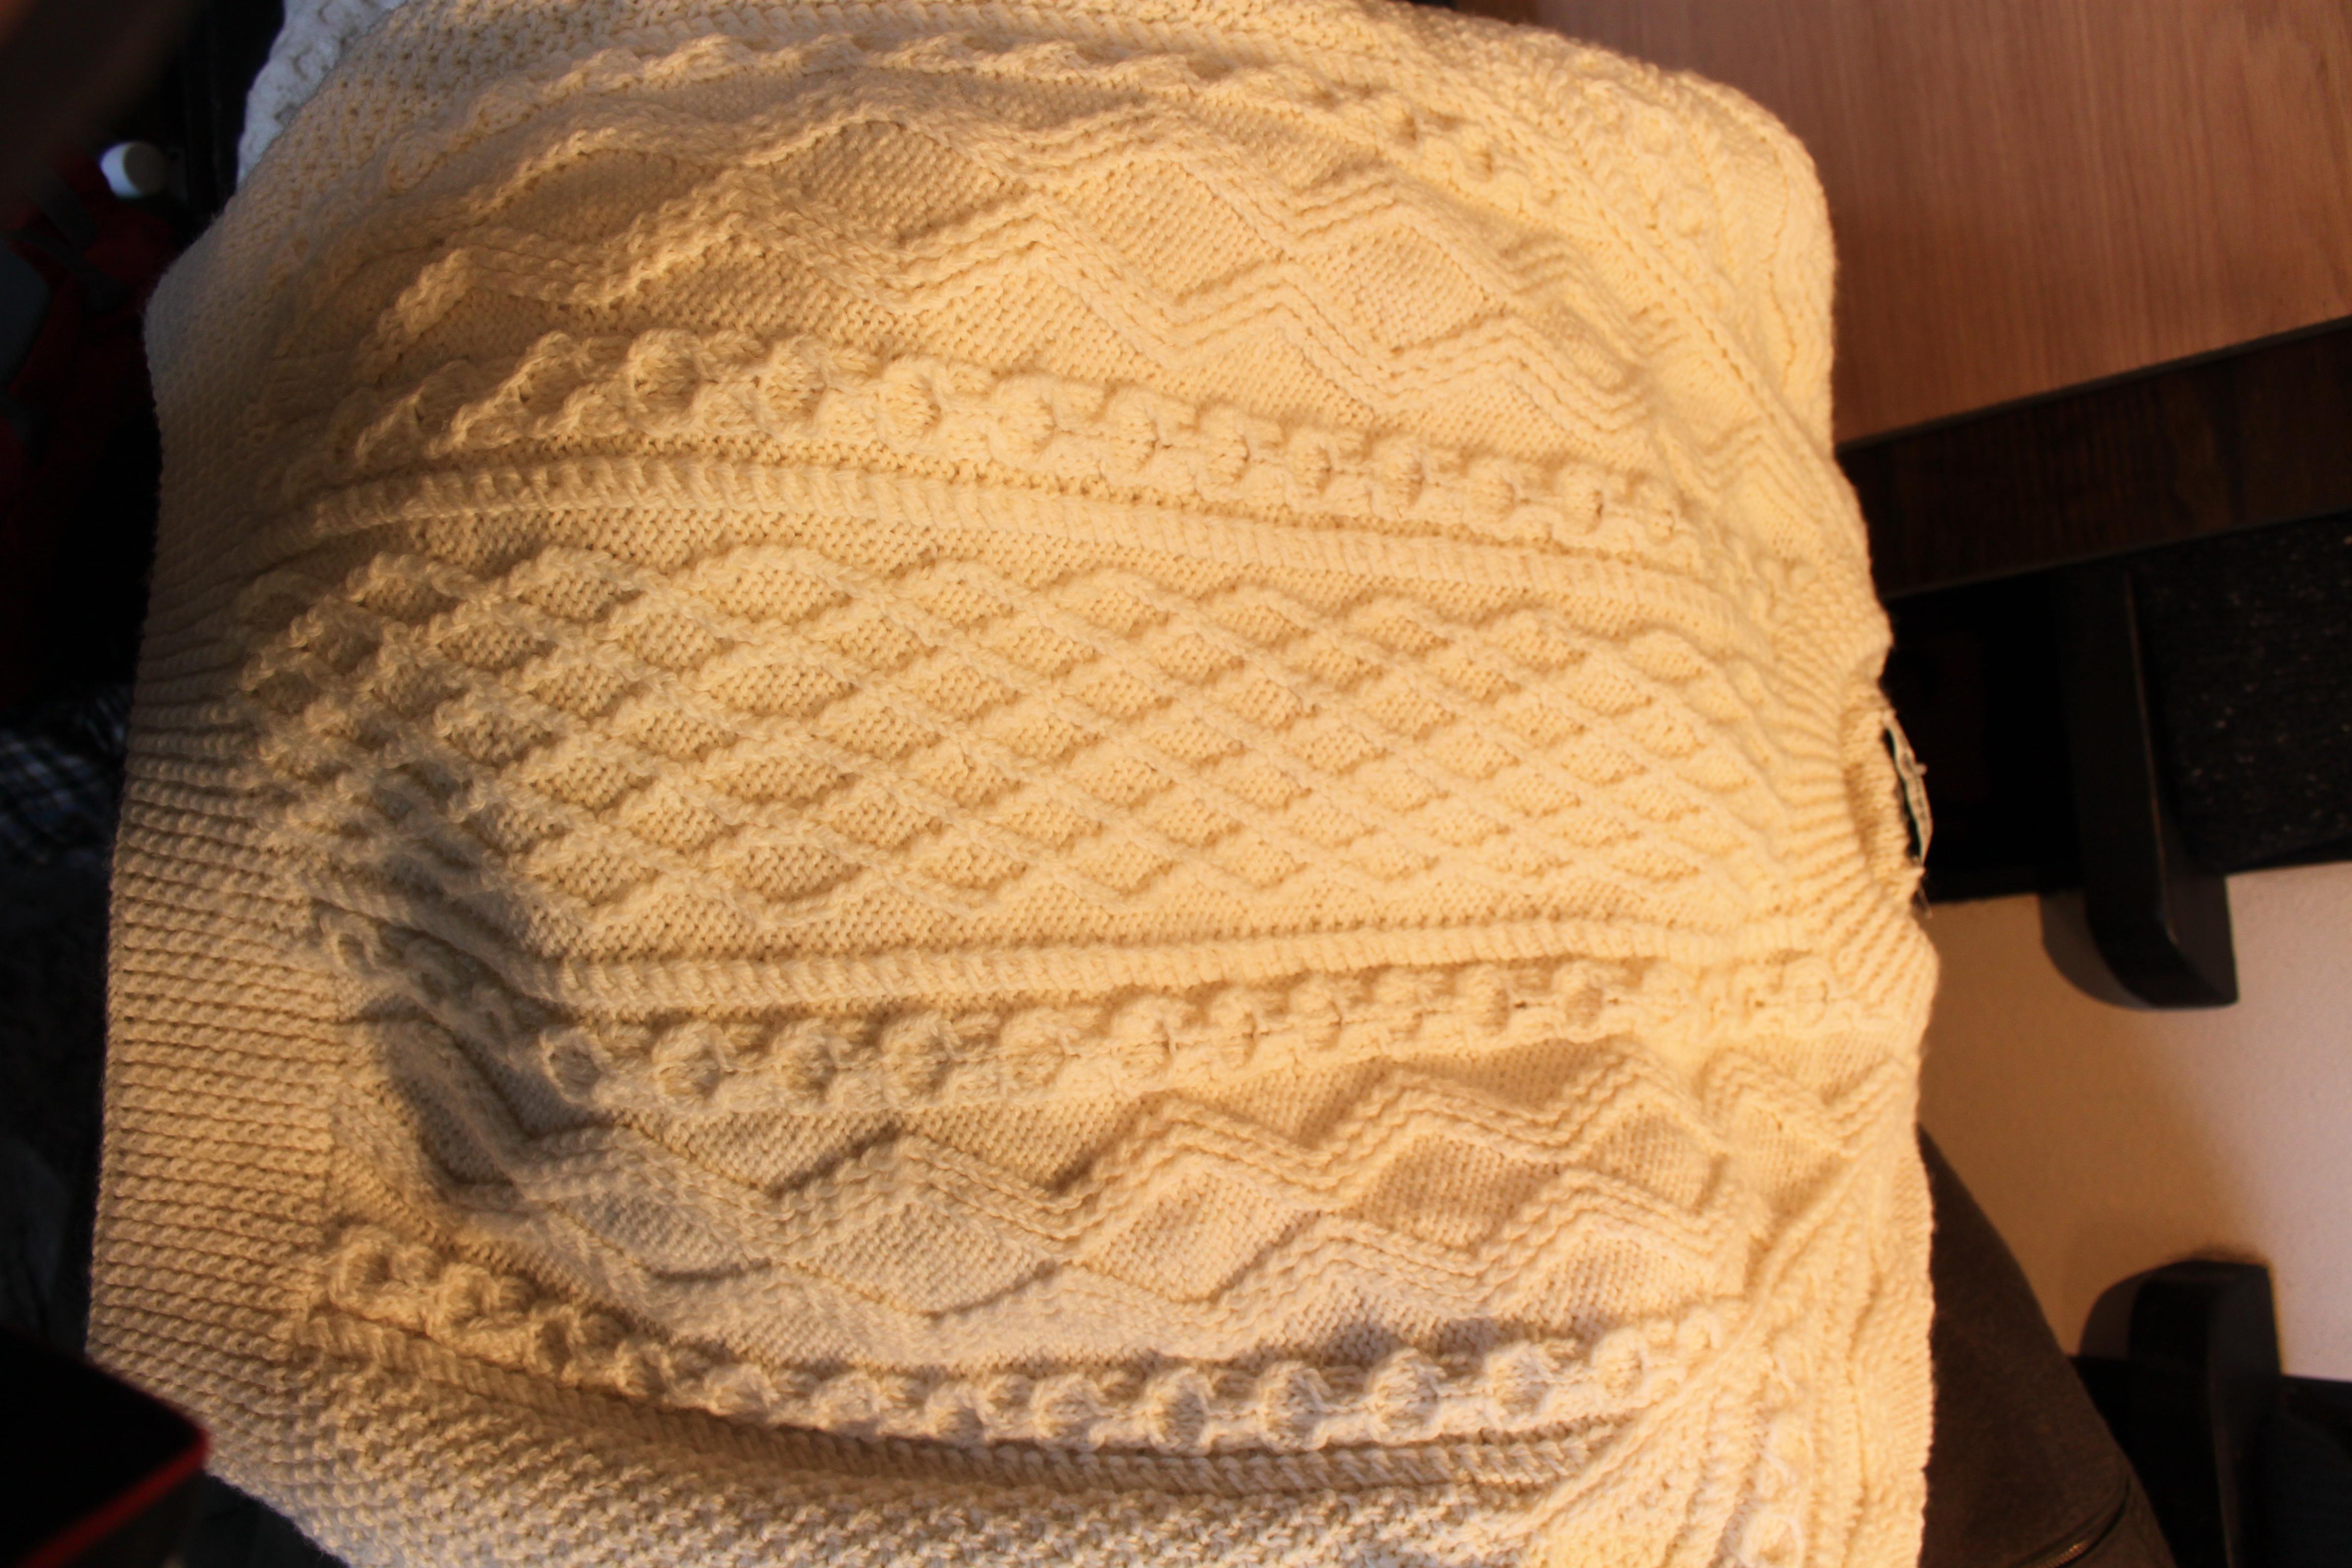 Knitting Genealogy - Episode 152 - The Knitmore Girls